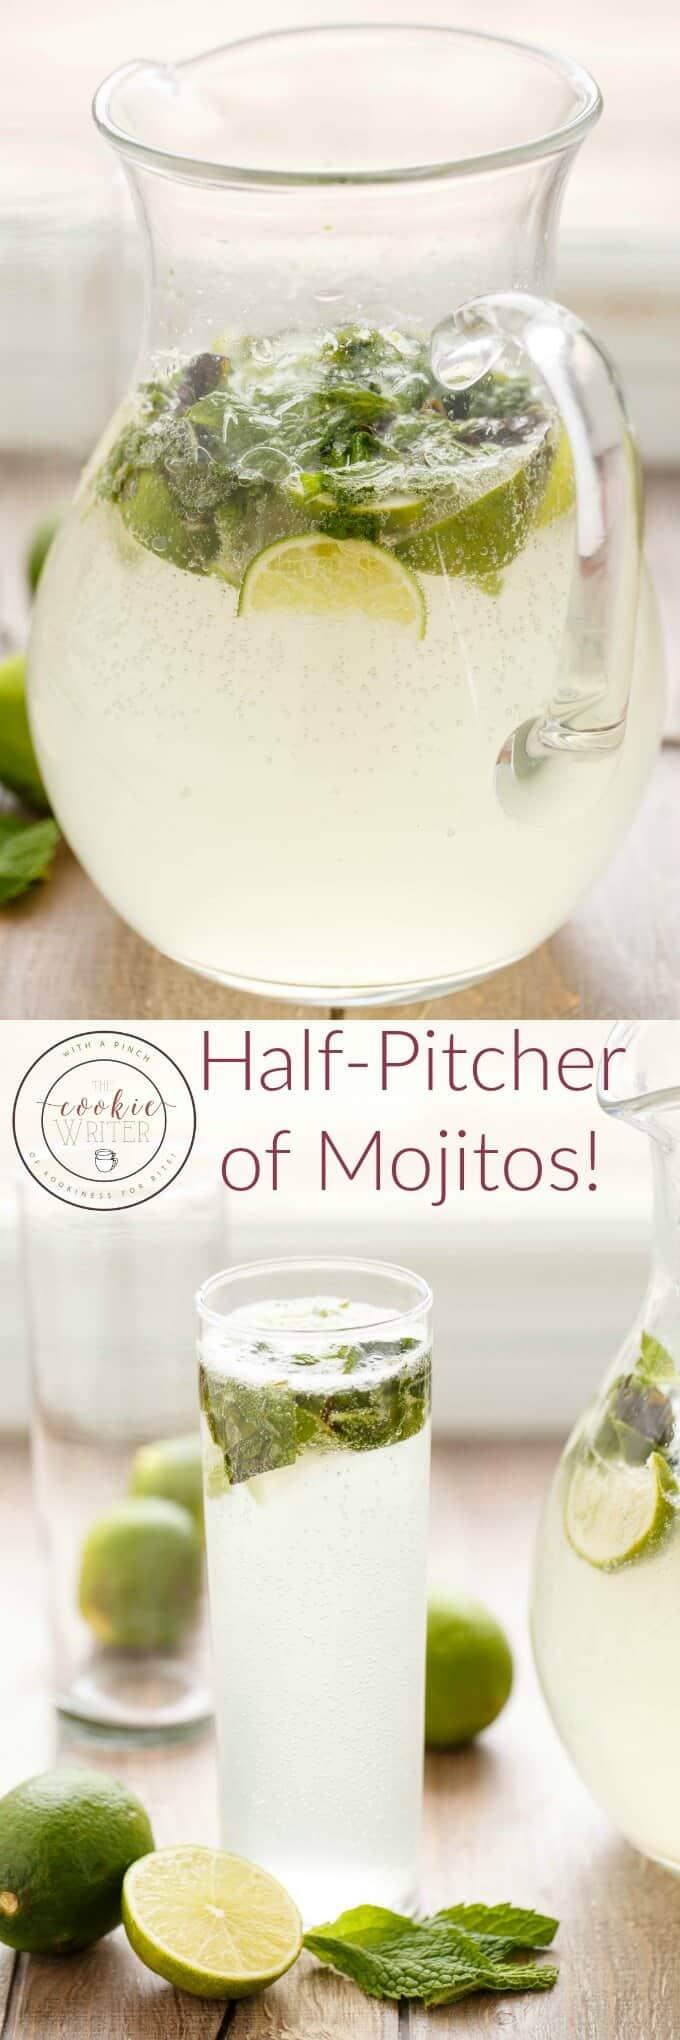 Half Pitcher of Mojitos